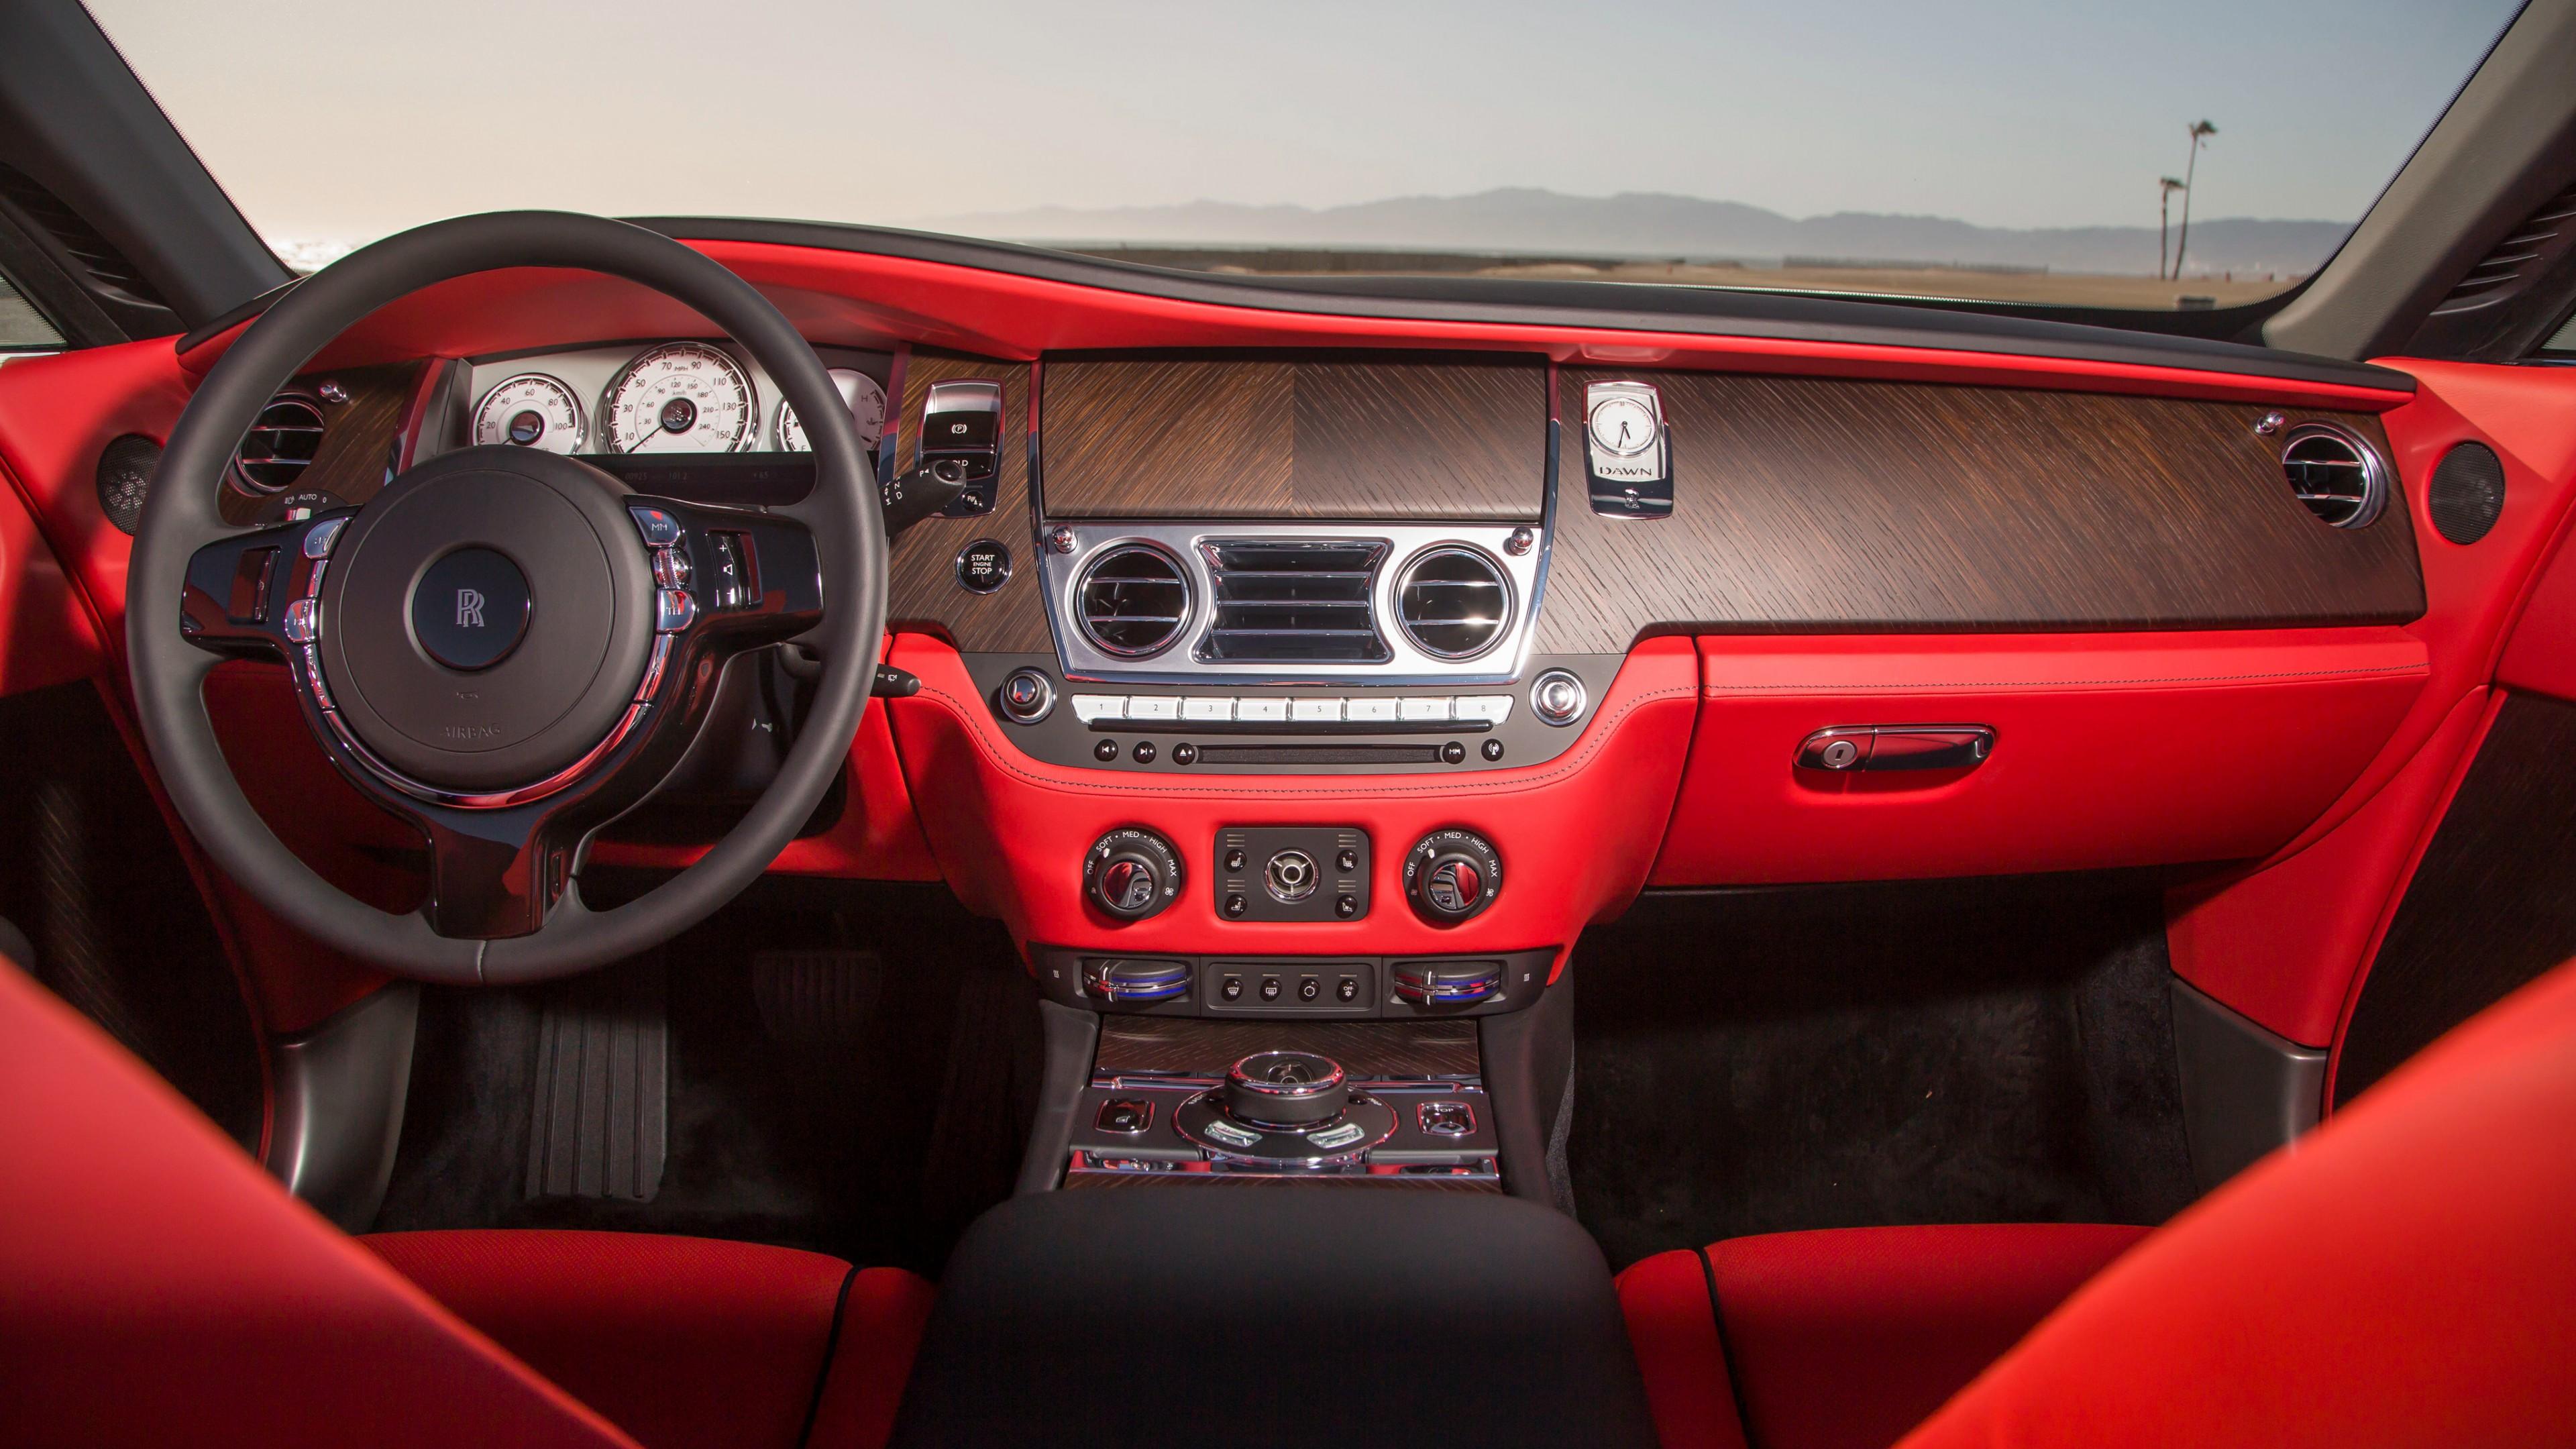 Wallpaper Rolls Royce Dawn Luxury Cars Interior Cars Bikes 10734